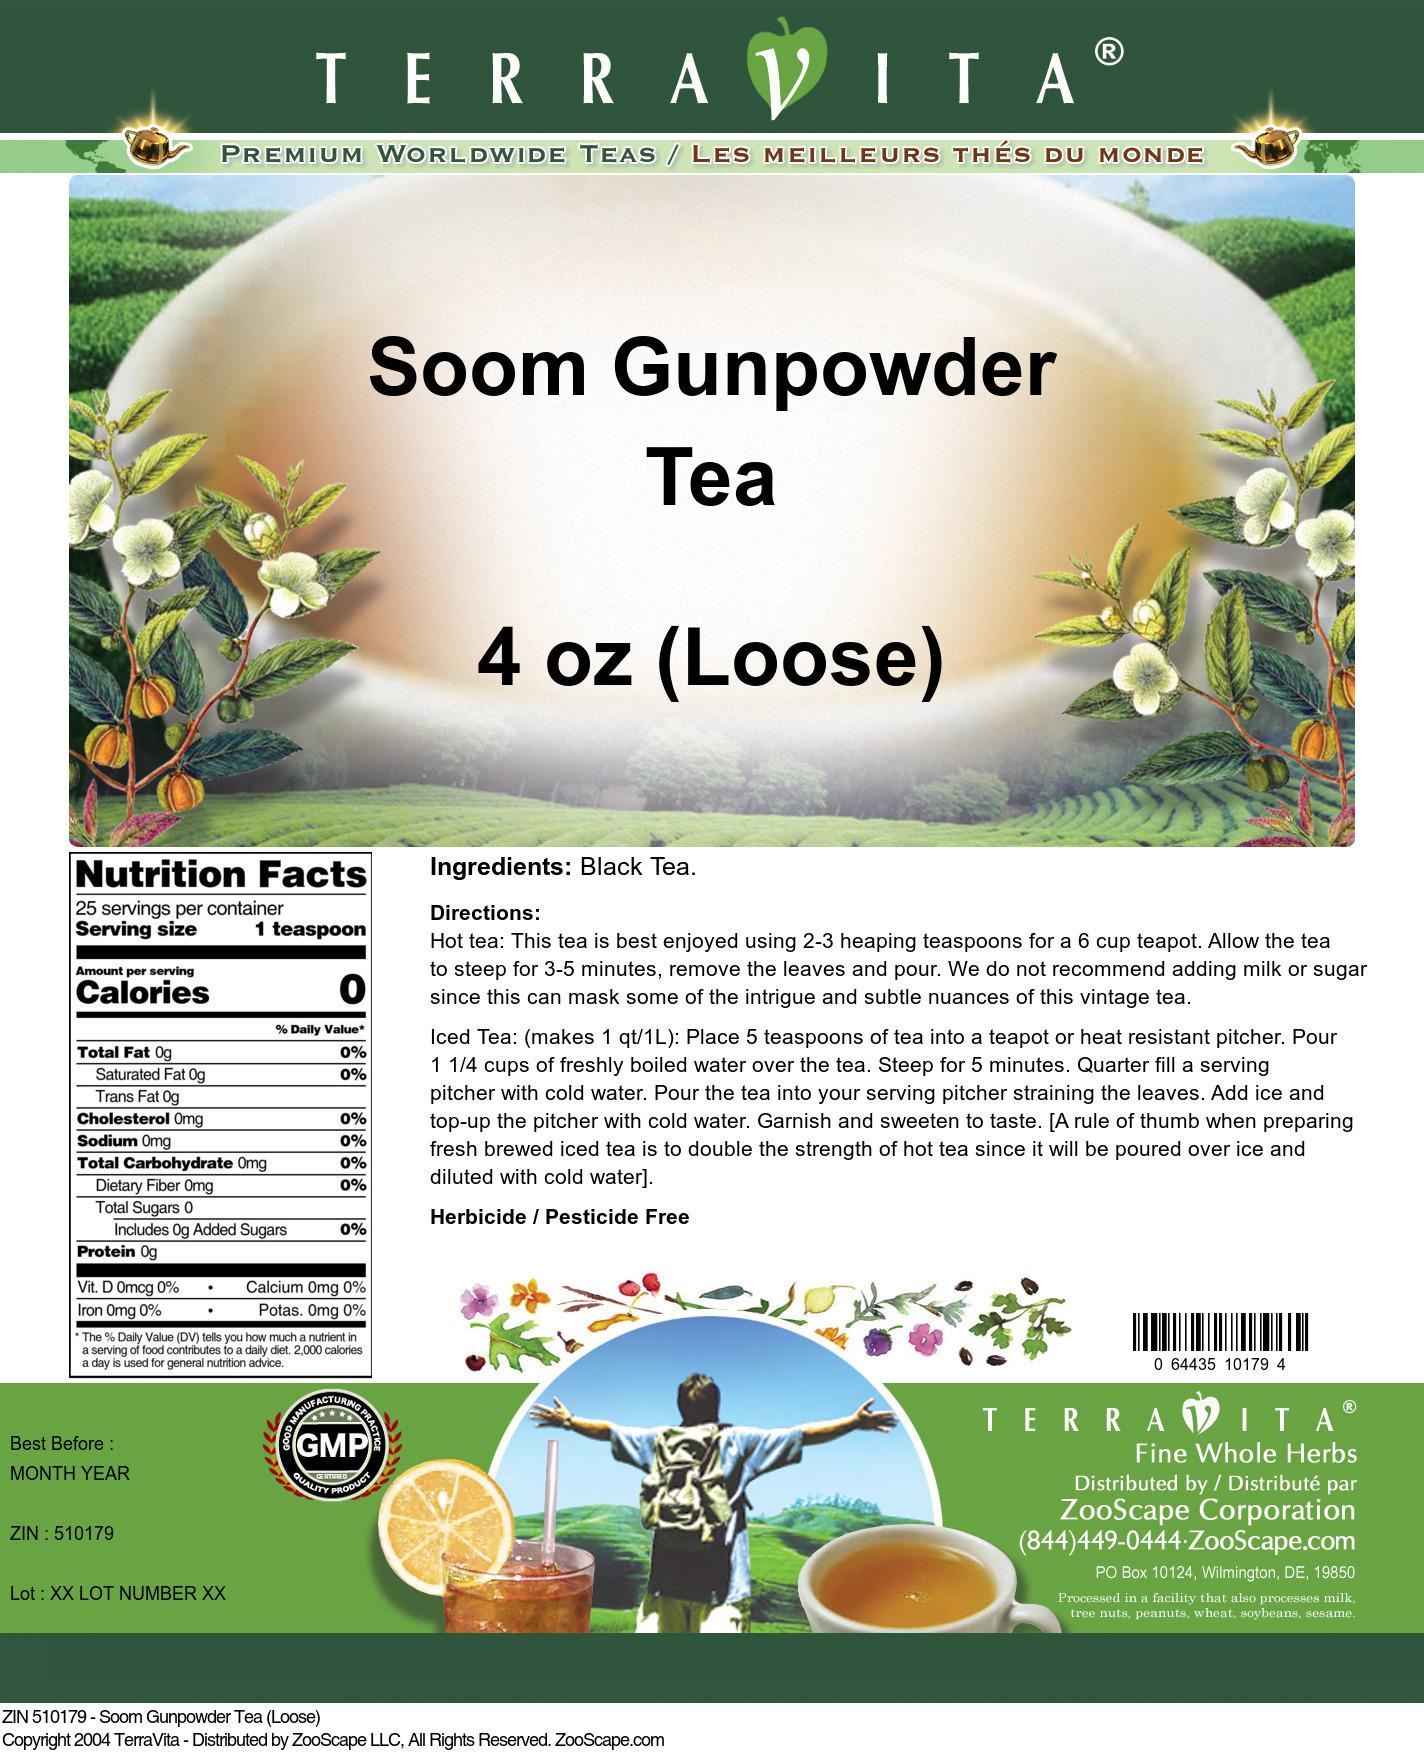 Soom Gunpowder Tea (Loose)